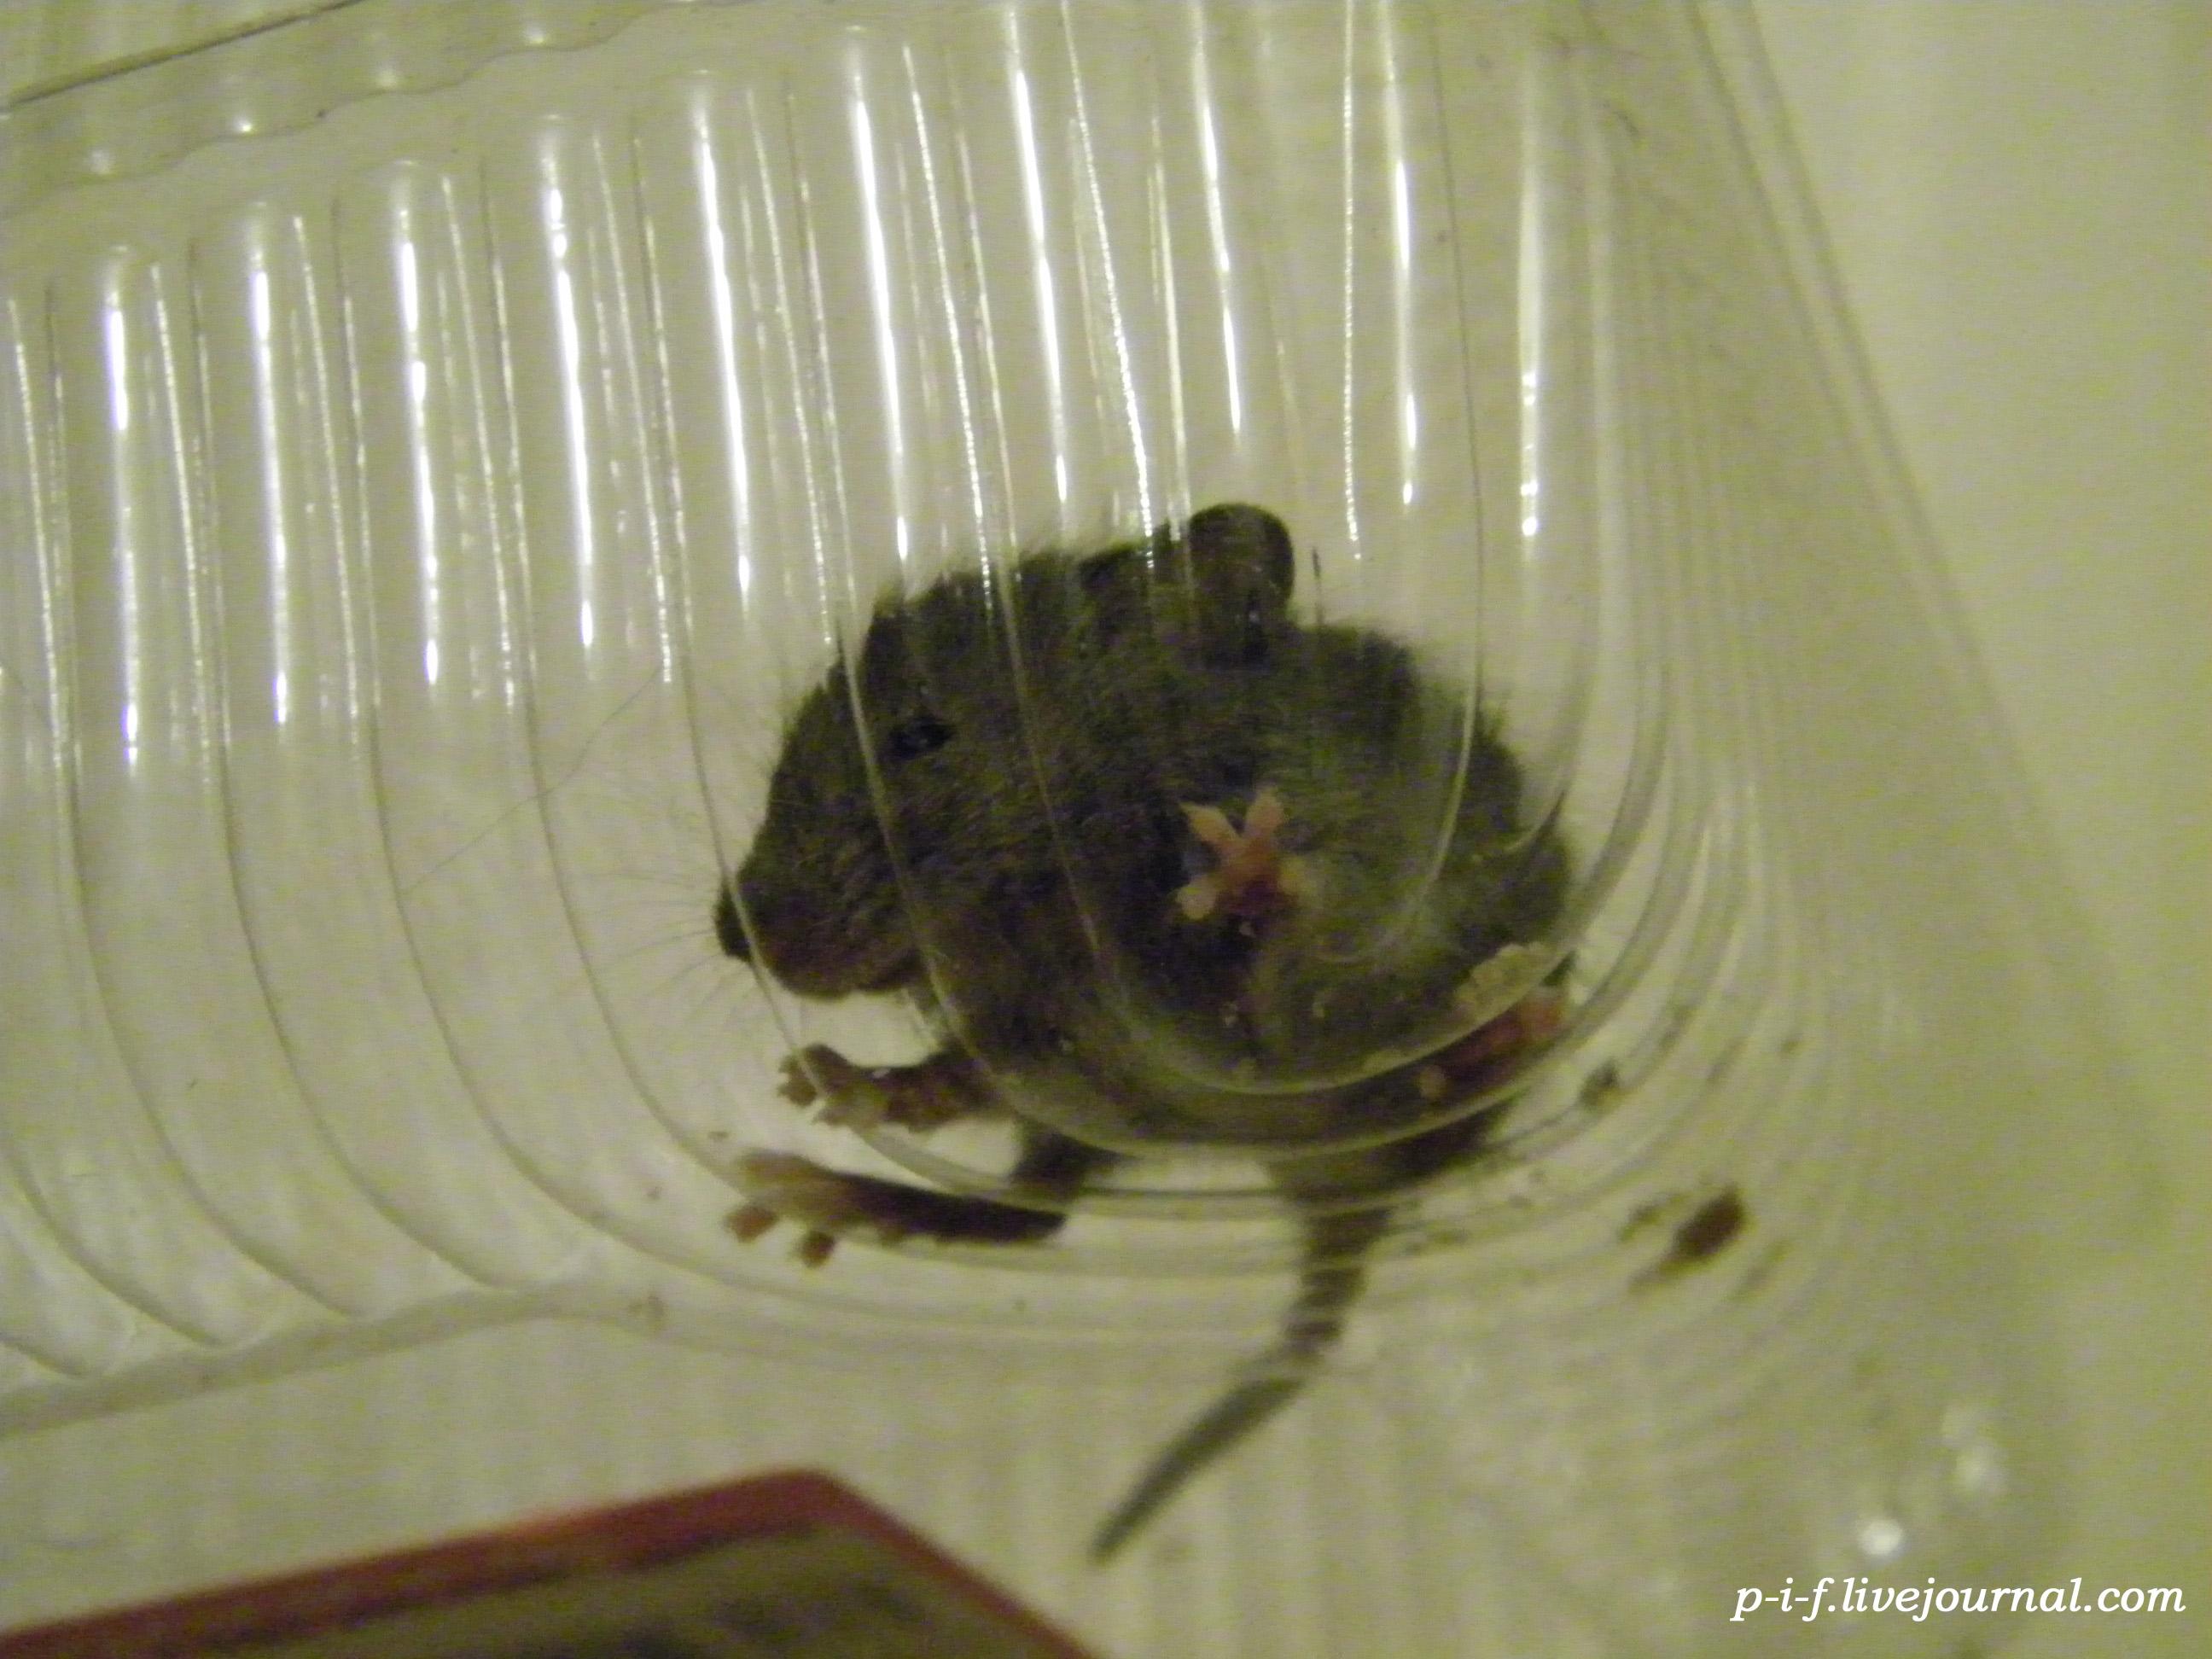 Поймал мыша - ешь неспеша.